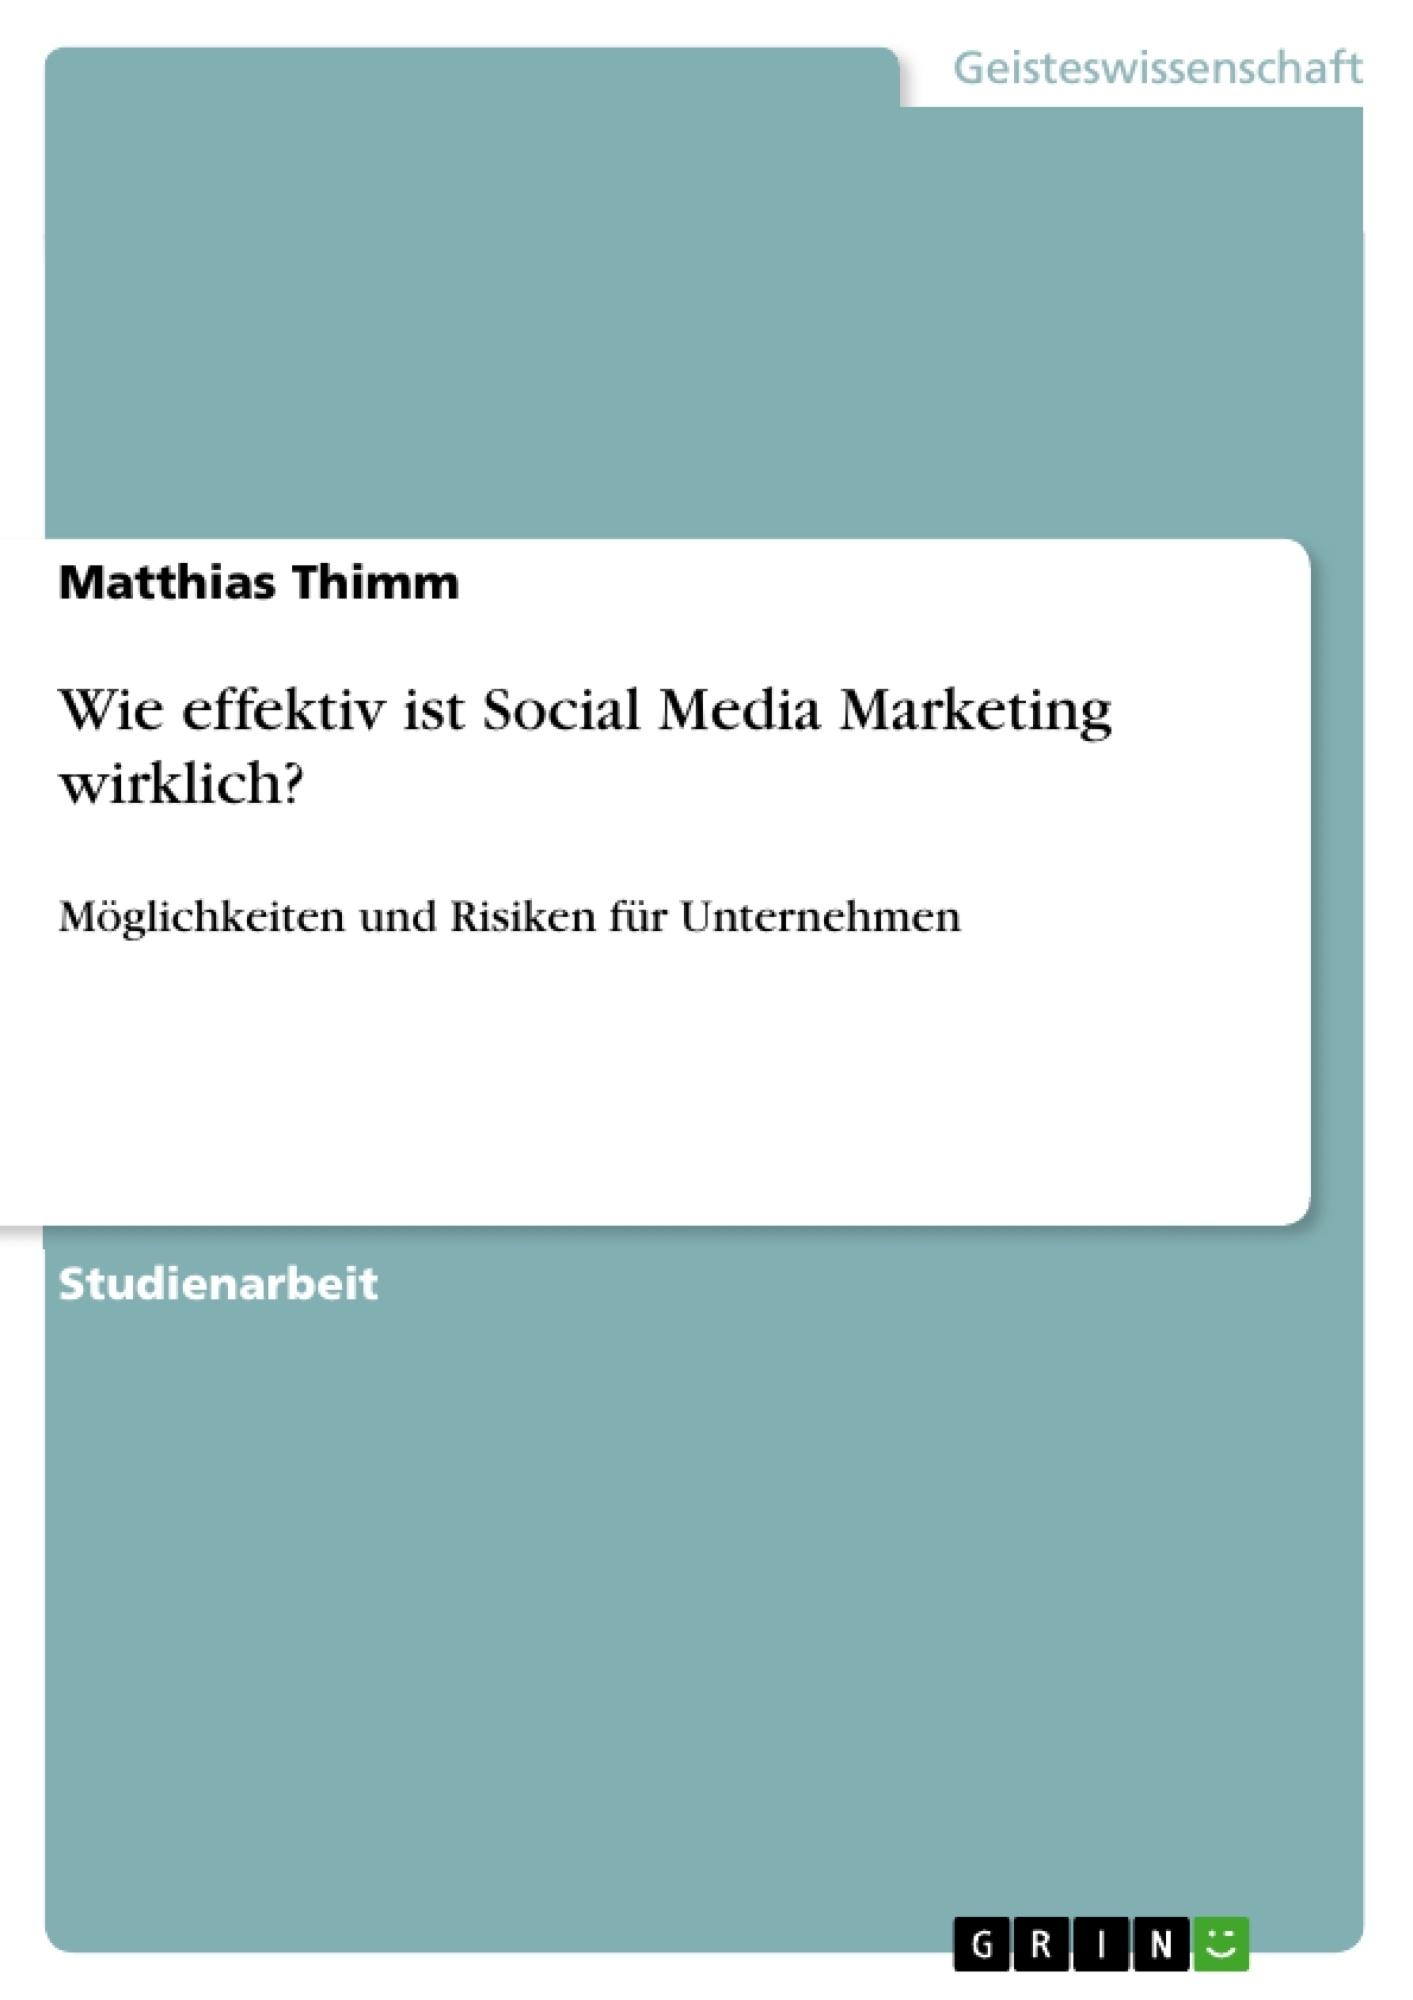 Titel: Wie effektiv ist Social Media Marketing wirklich?